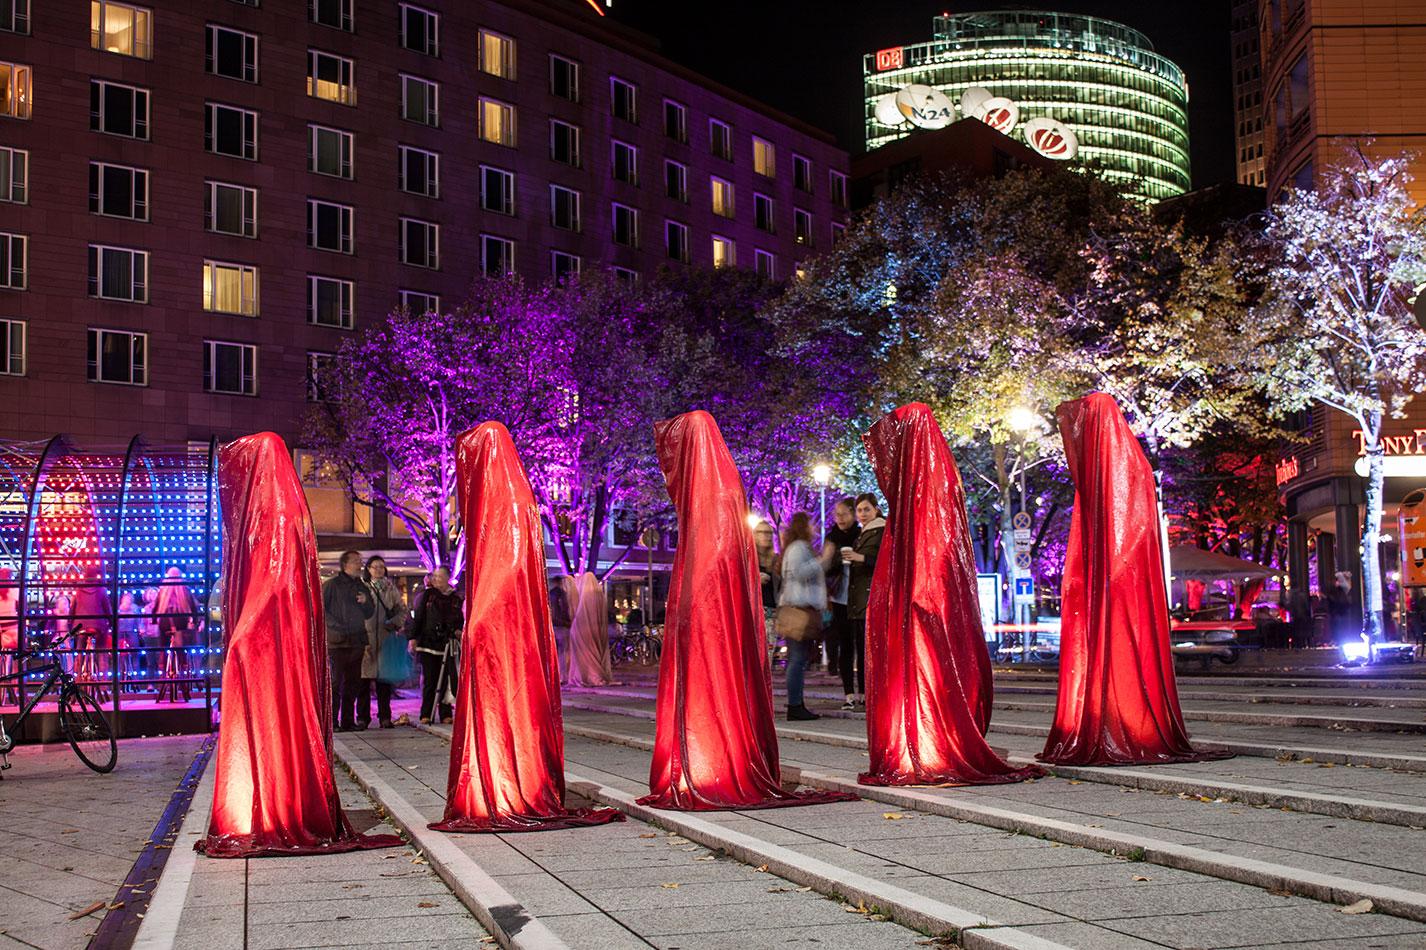 festival-of-lights-berlin-light-art-festival-contemporary-fine-art-design-show-guardiansof-time-manfred-kili-kielnhofer-sculpture-3823